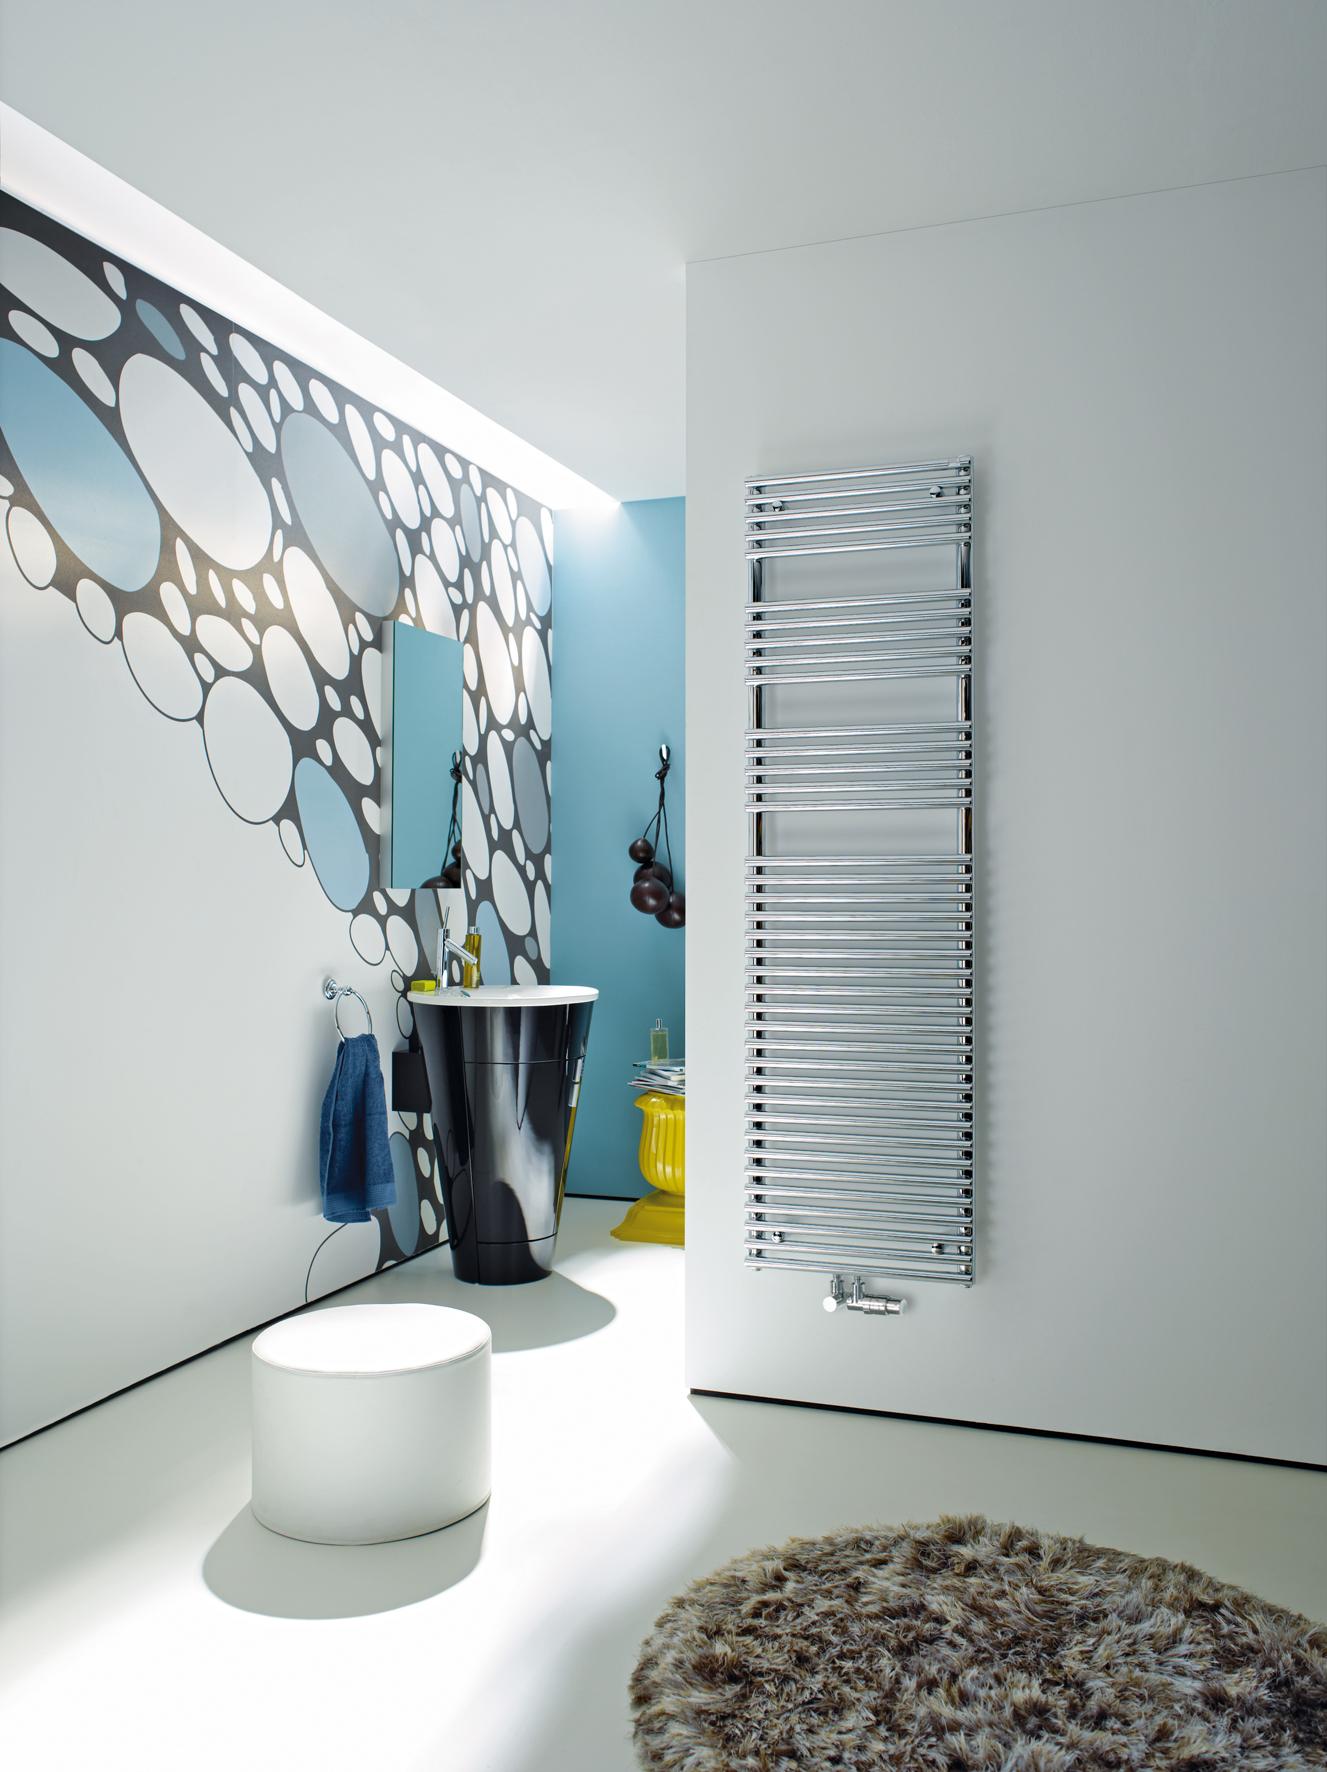 radiateur s che serviettes cala d 39 acova en claustra chauffage pinterest. Black Bedroom Furniture Sets. Home Design Ideas